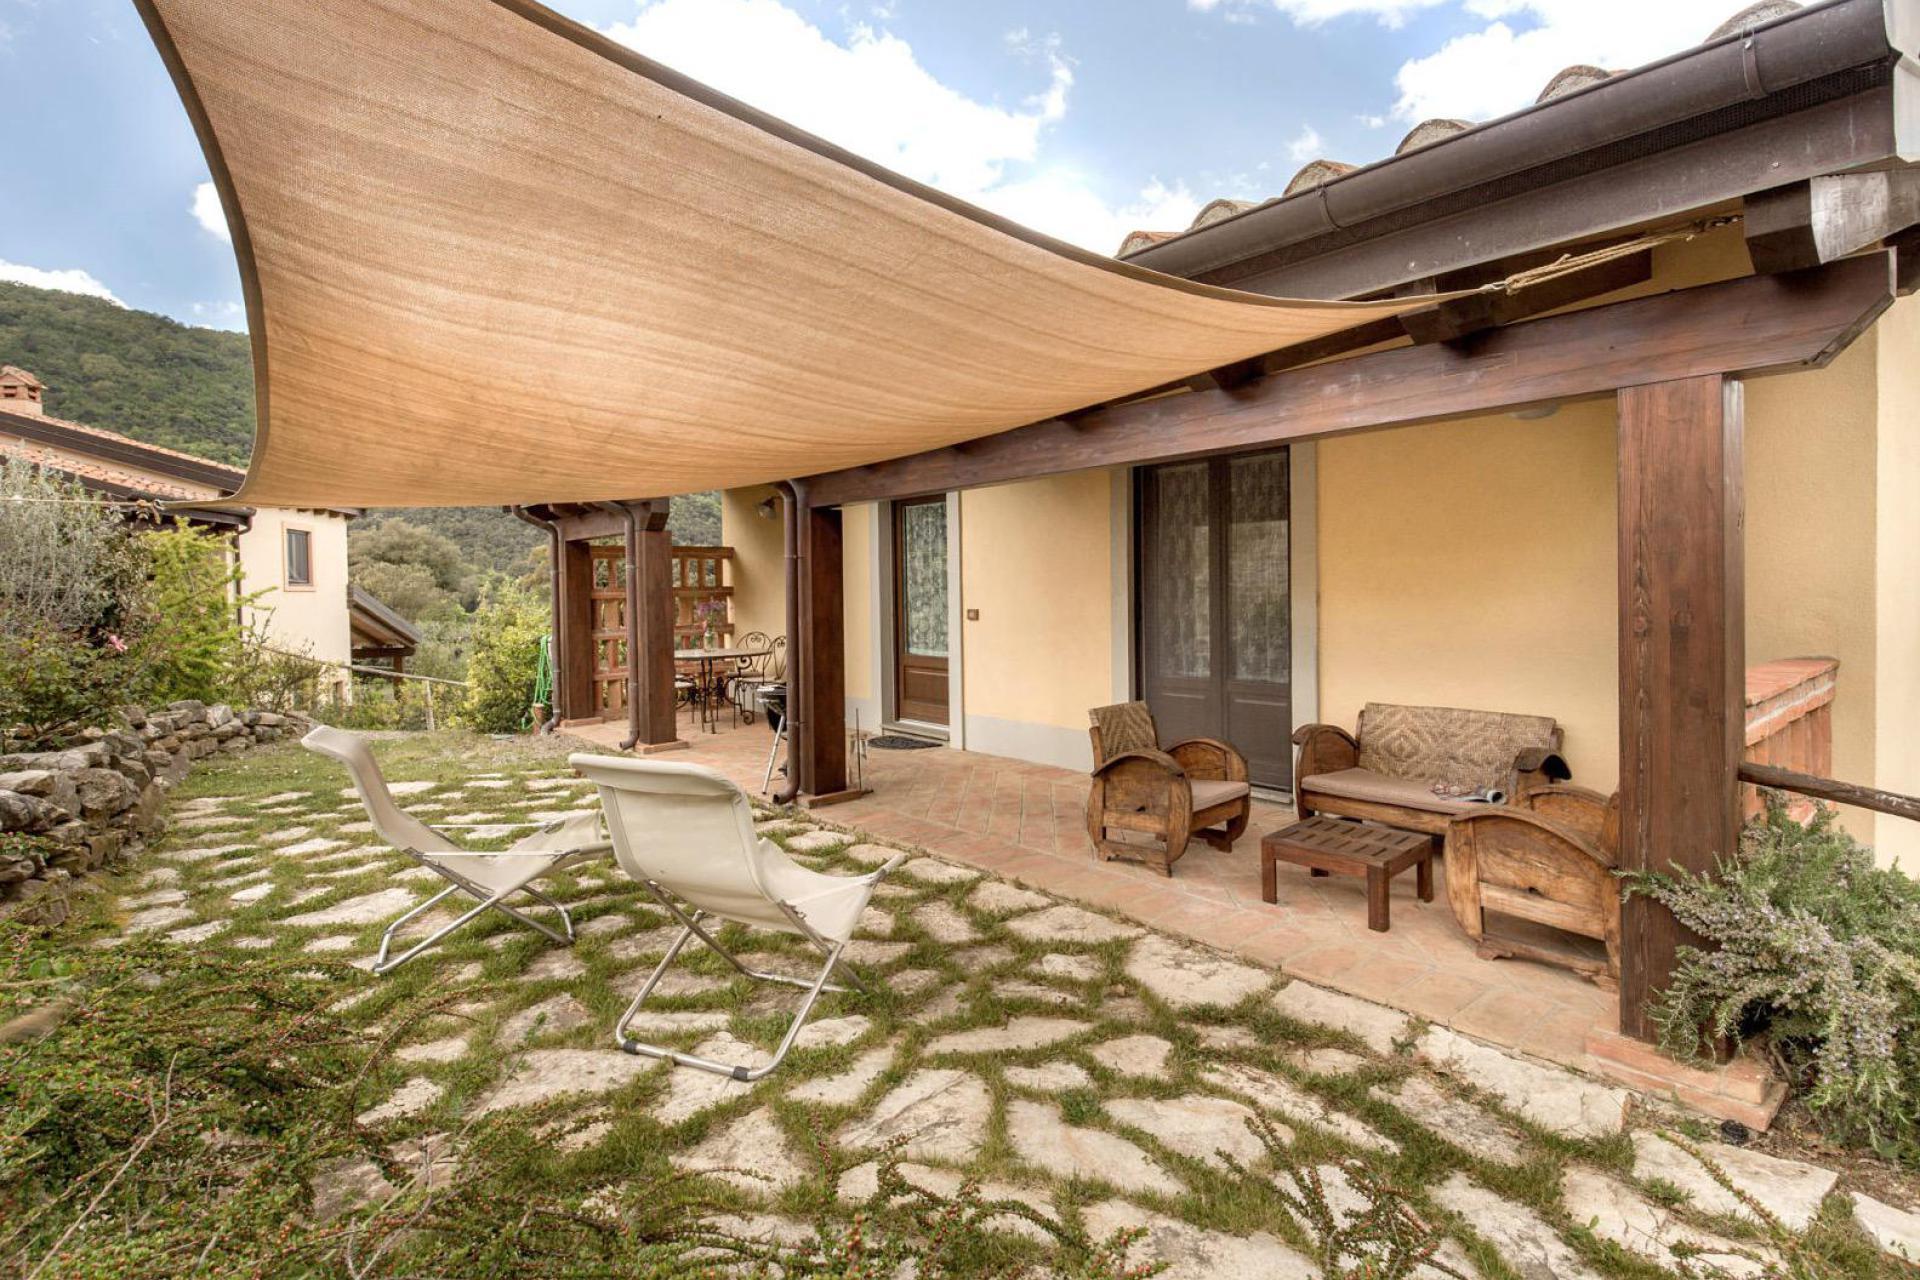 Agriturismo Toskana Appartement Maremma - luxuriöse und ruhig | myitalyselection.de